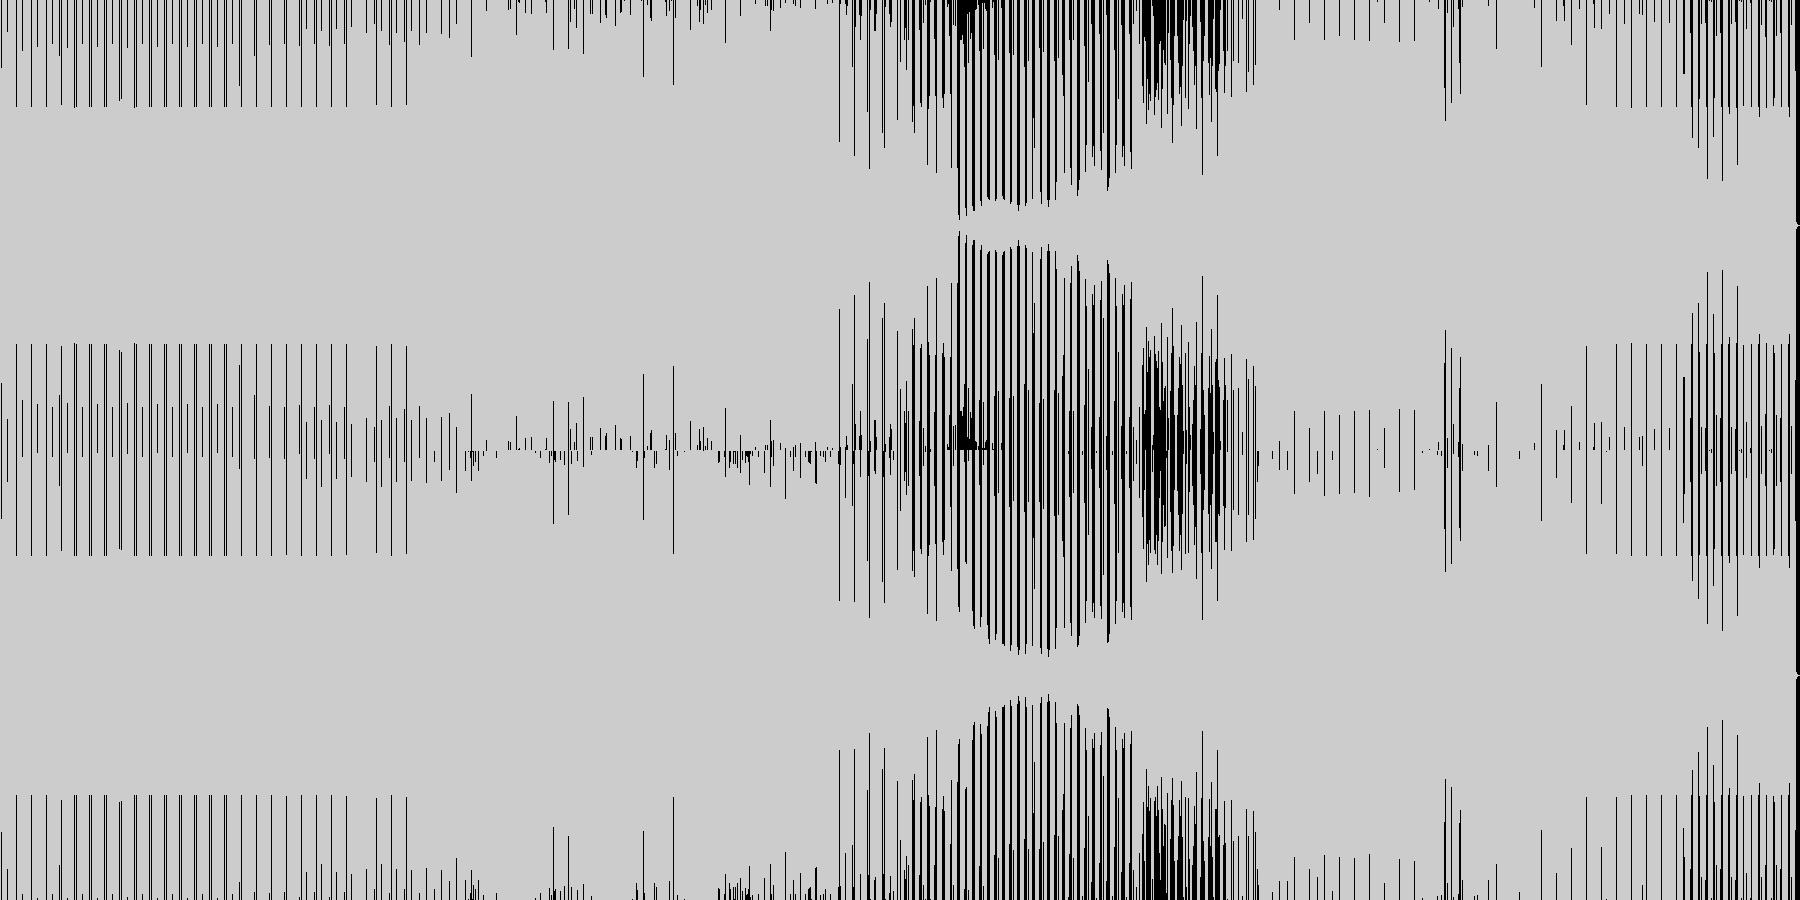 minimal house 38 の未再生の波形